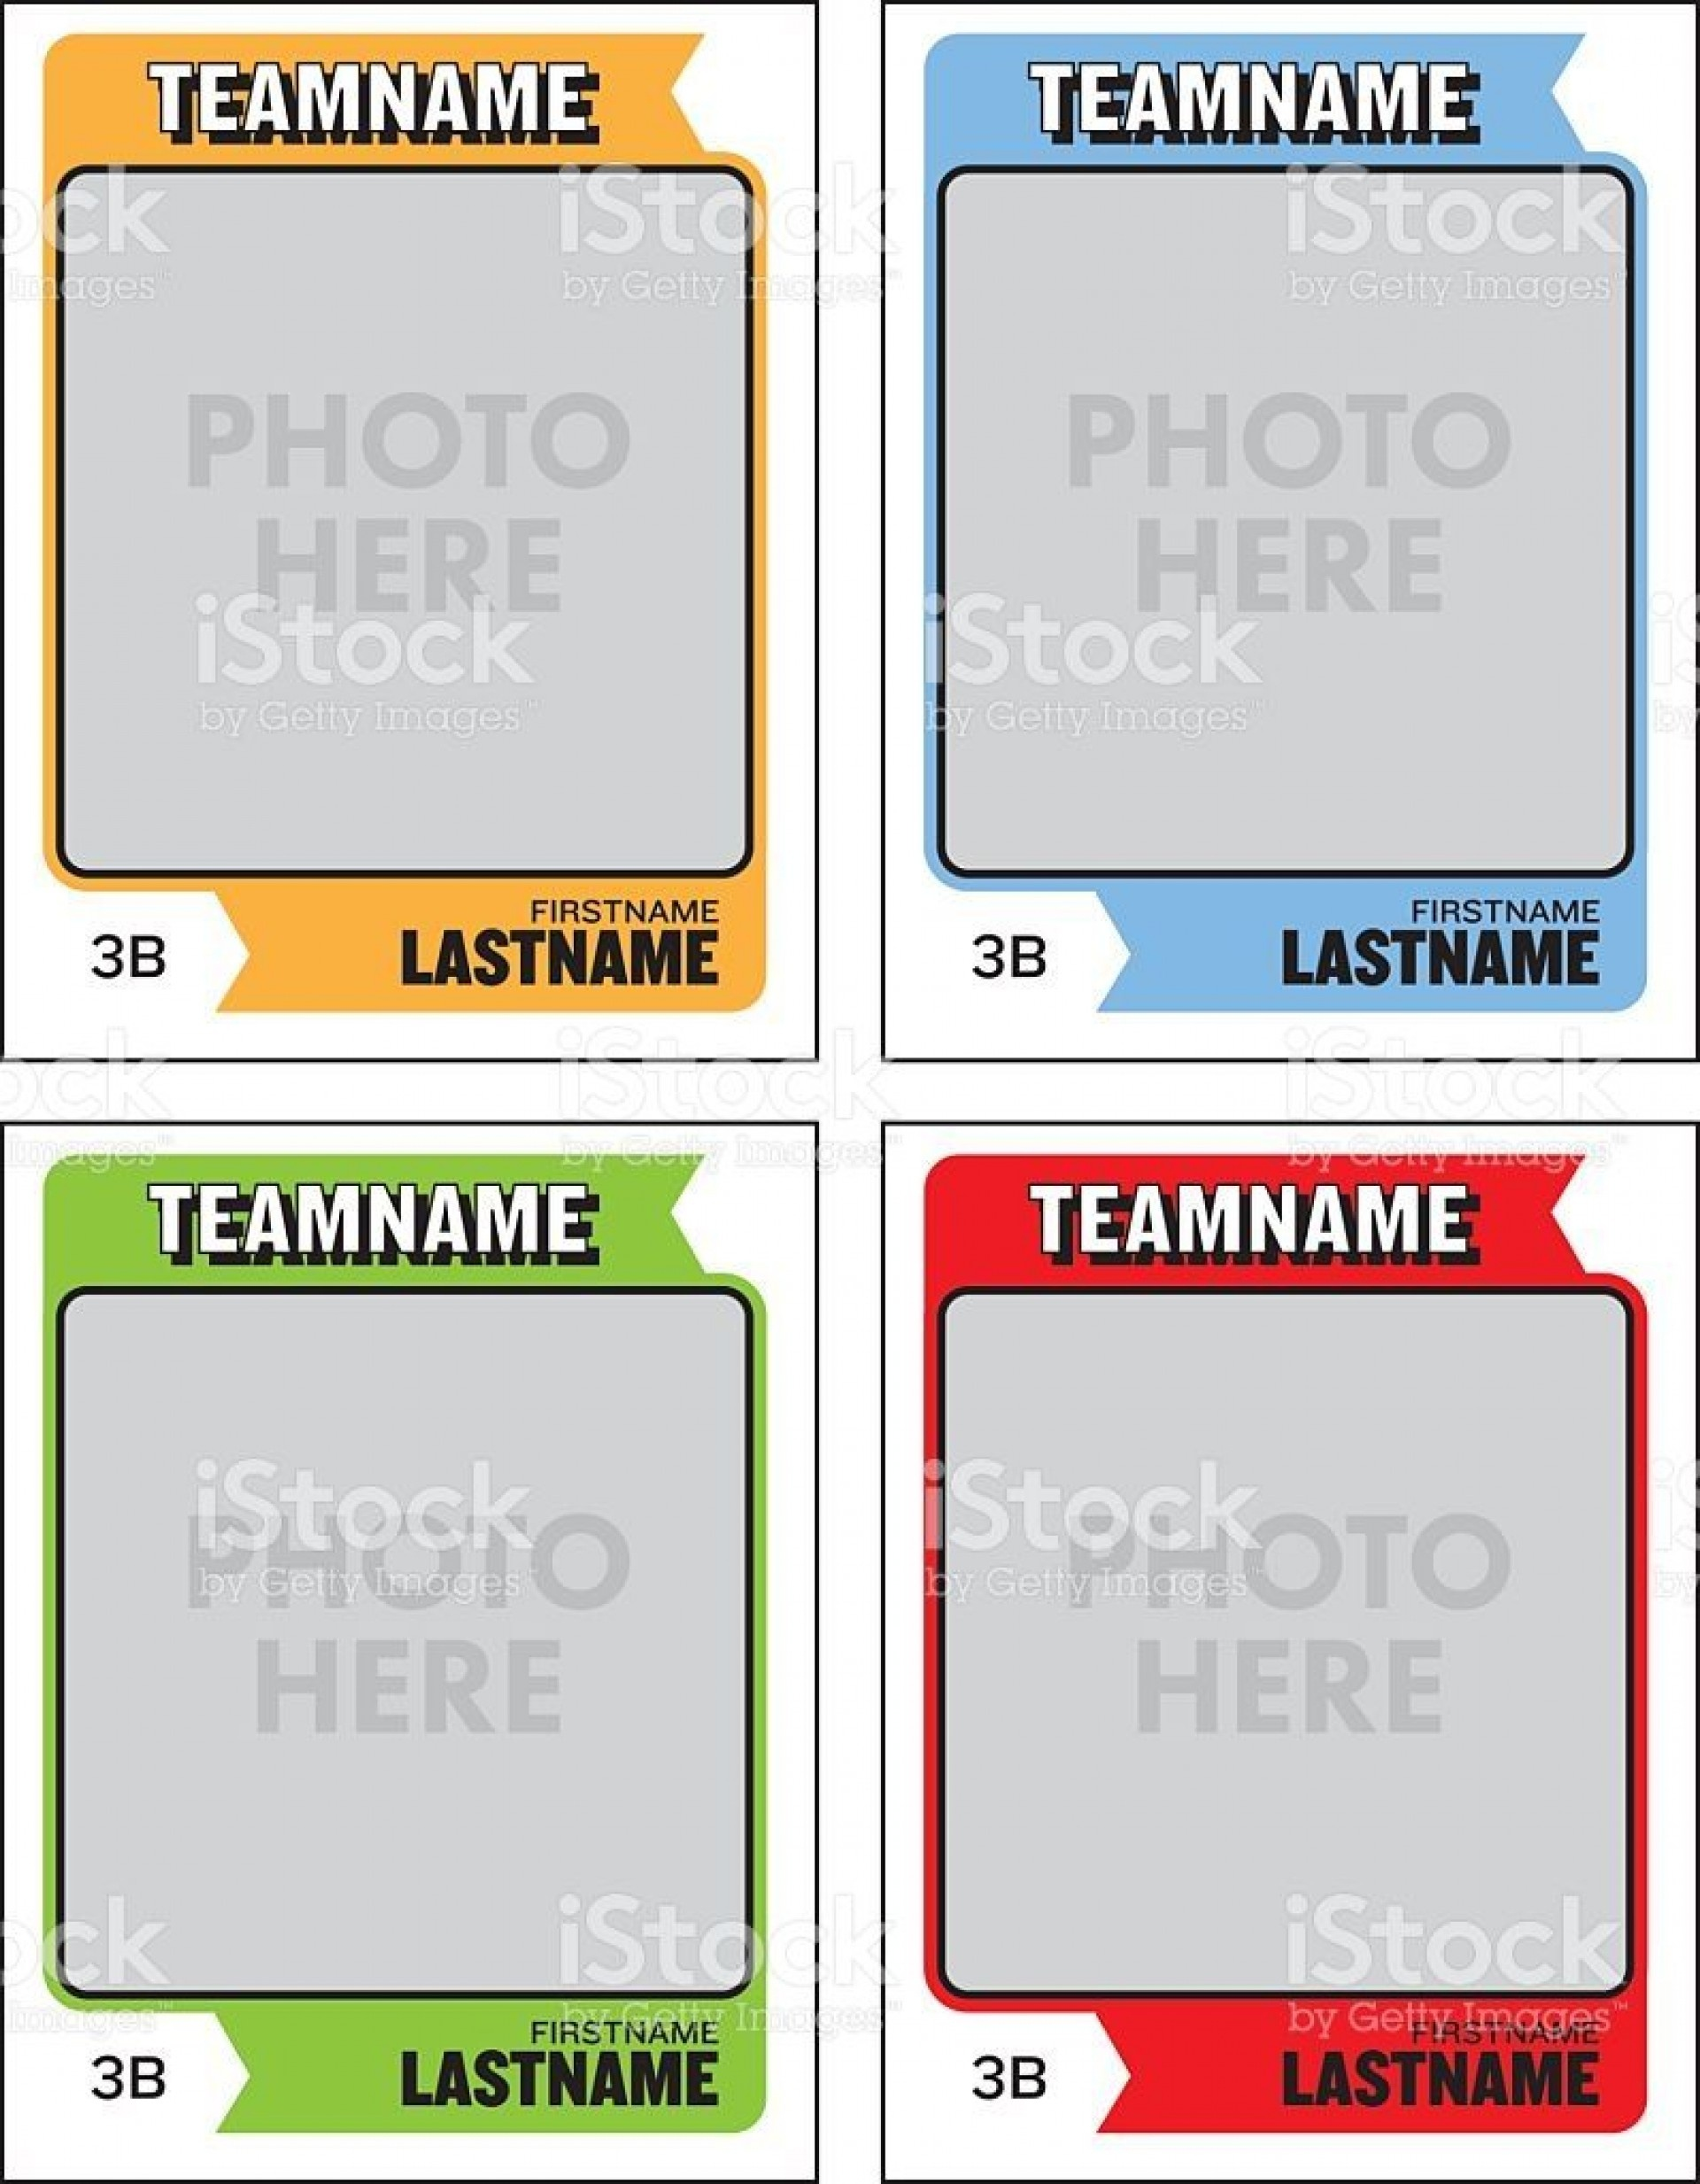 009 Free Baseball Card Template Magnificent Ideas Printable Trading - Free Printable Baseball Card Template